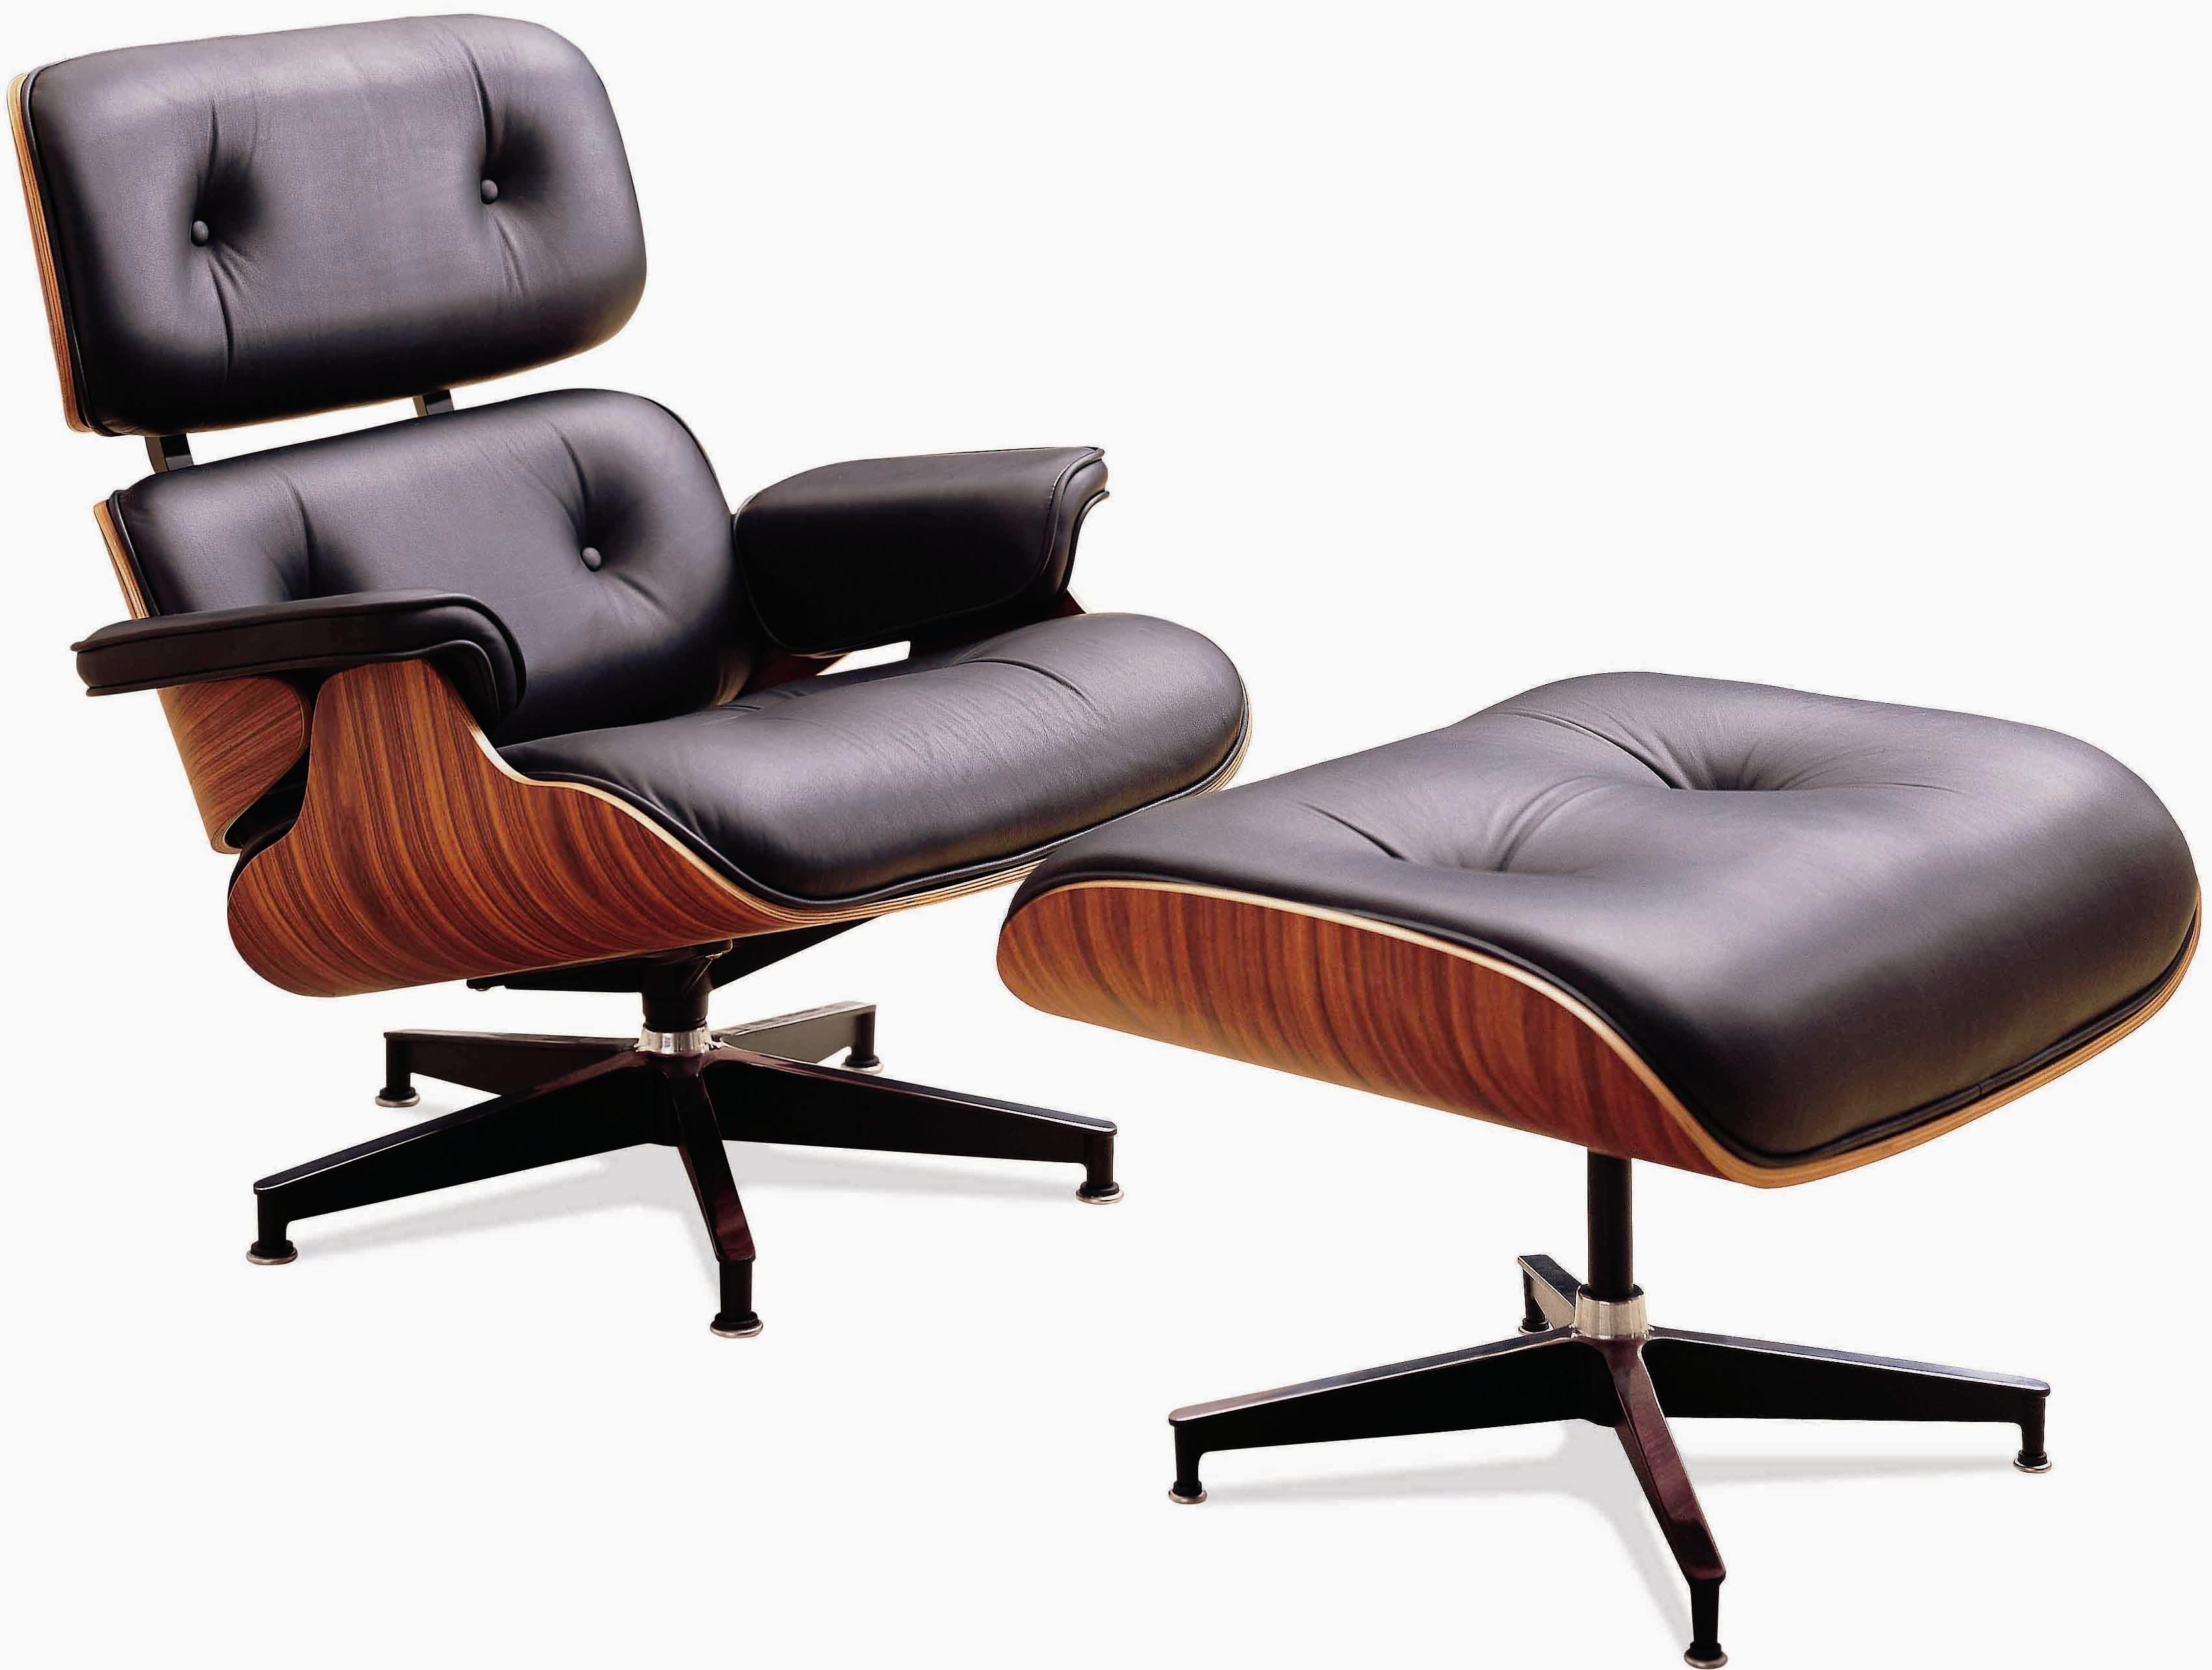 Burford Designs Modern Living and Modern Furniture